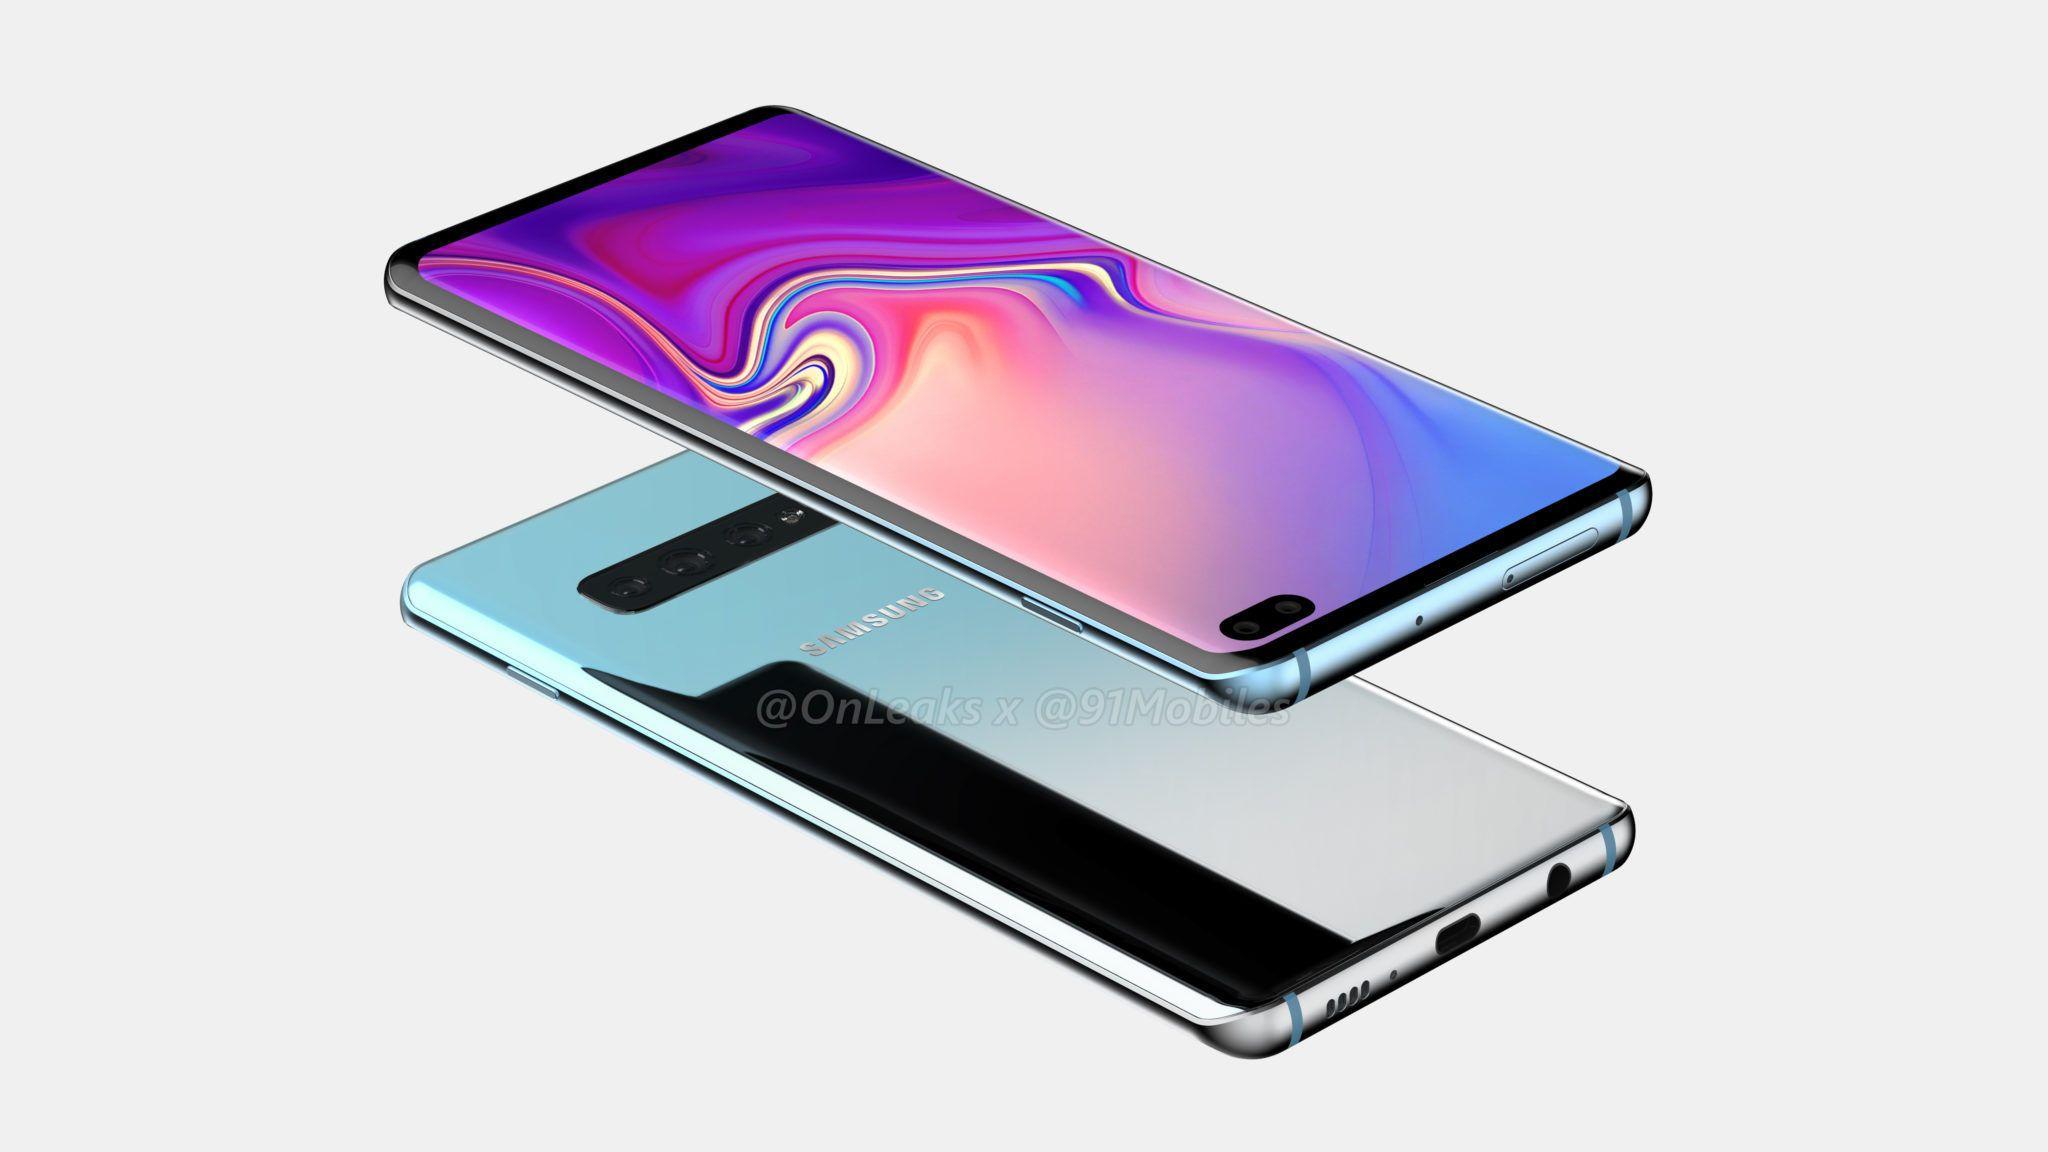 Hevder Samsung Galaxy S10 kan koste over 15 000 kroner